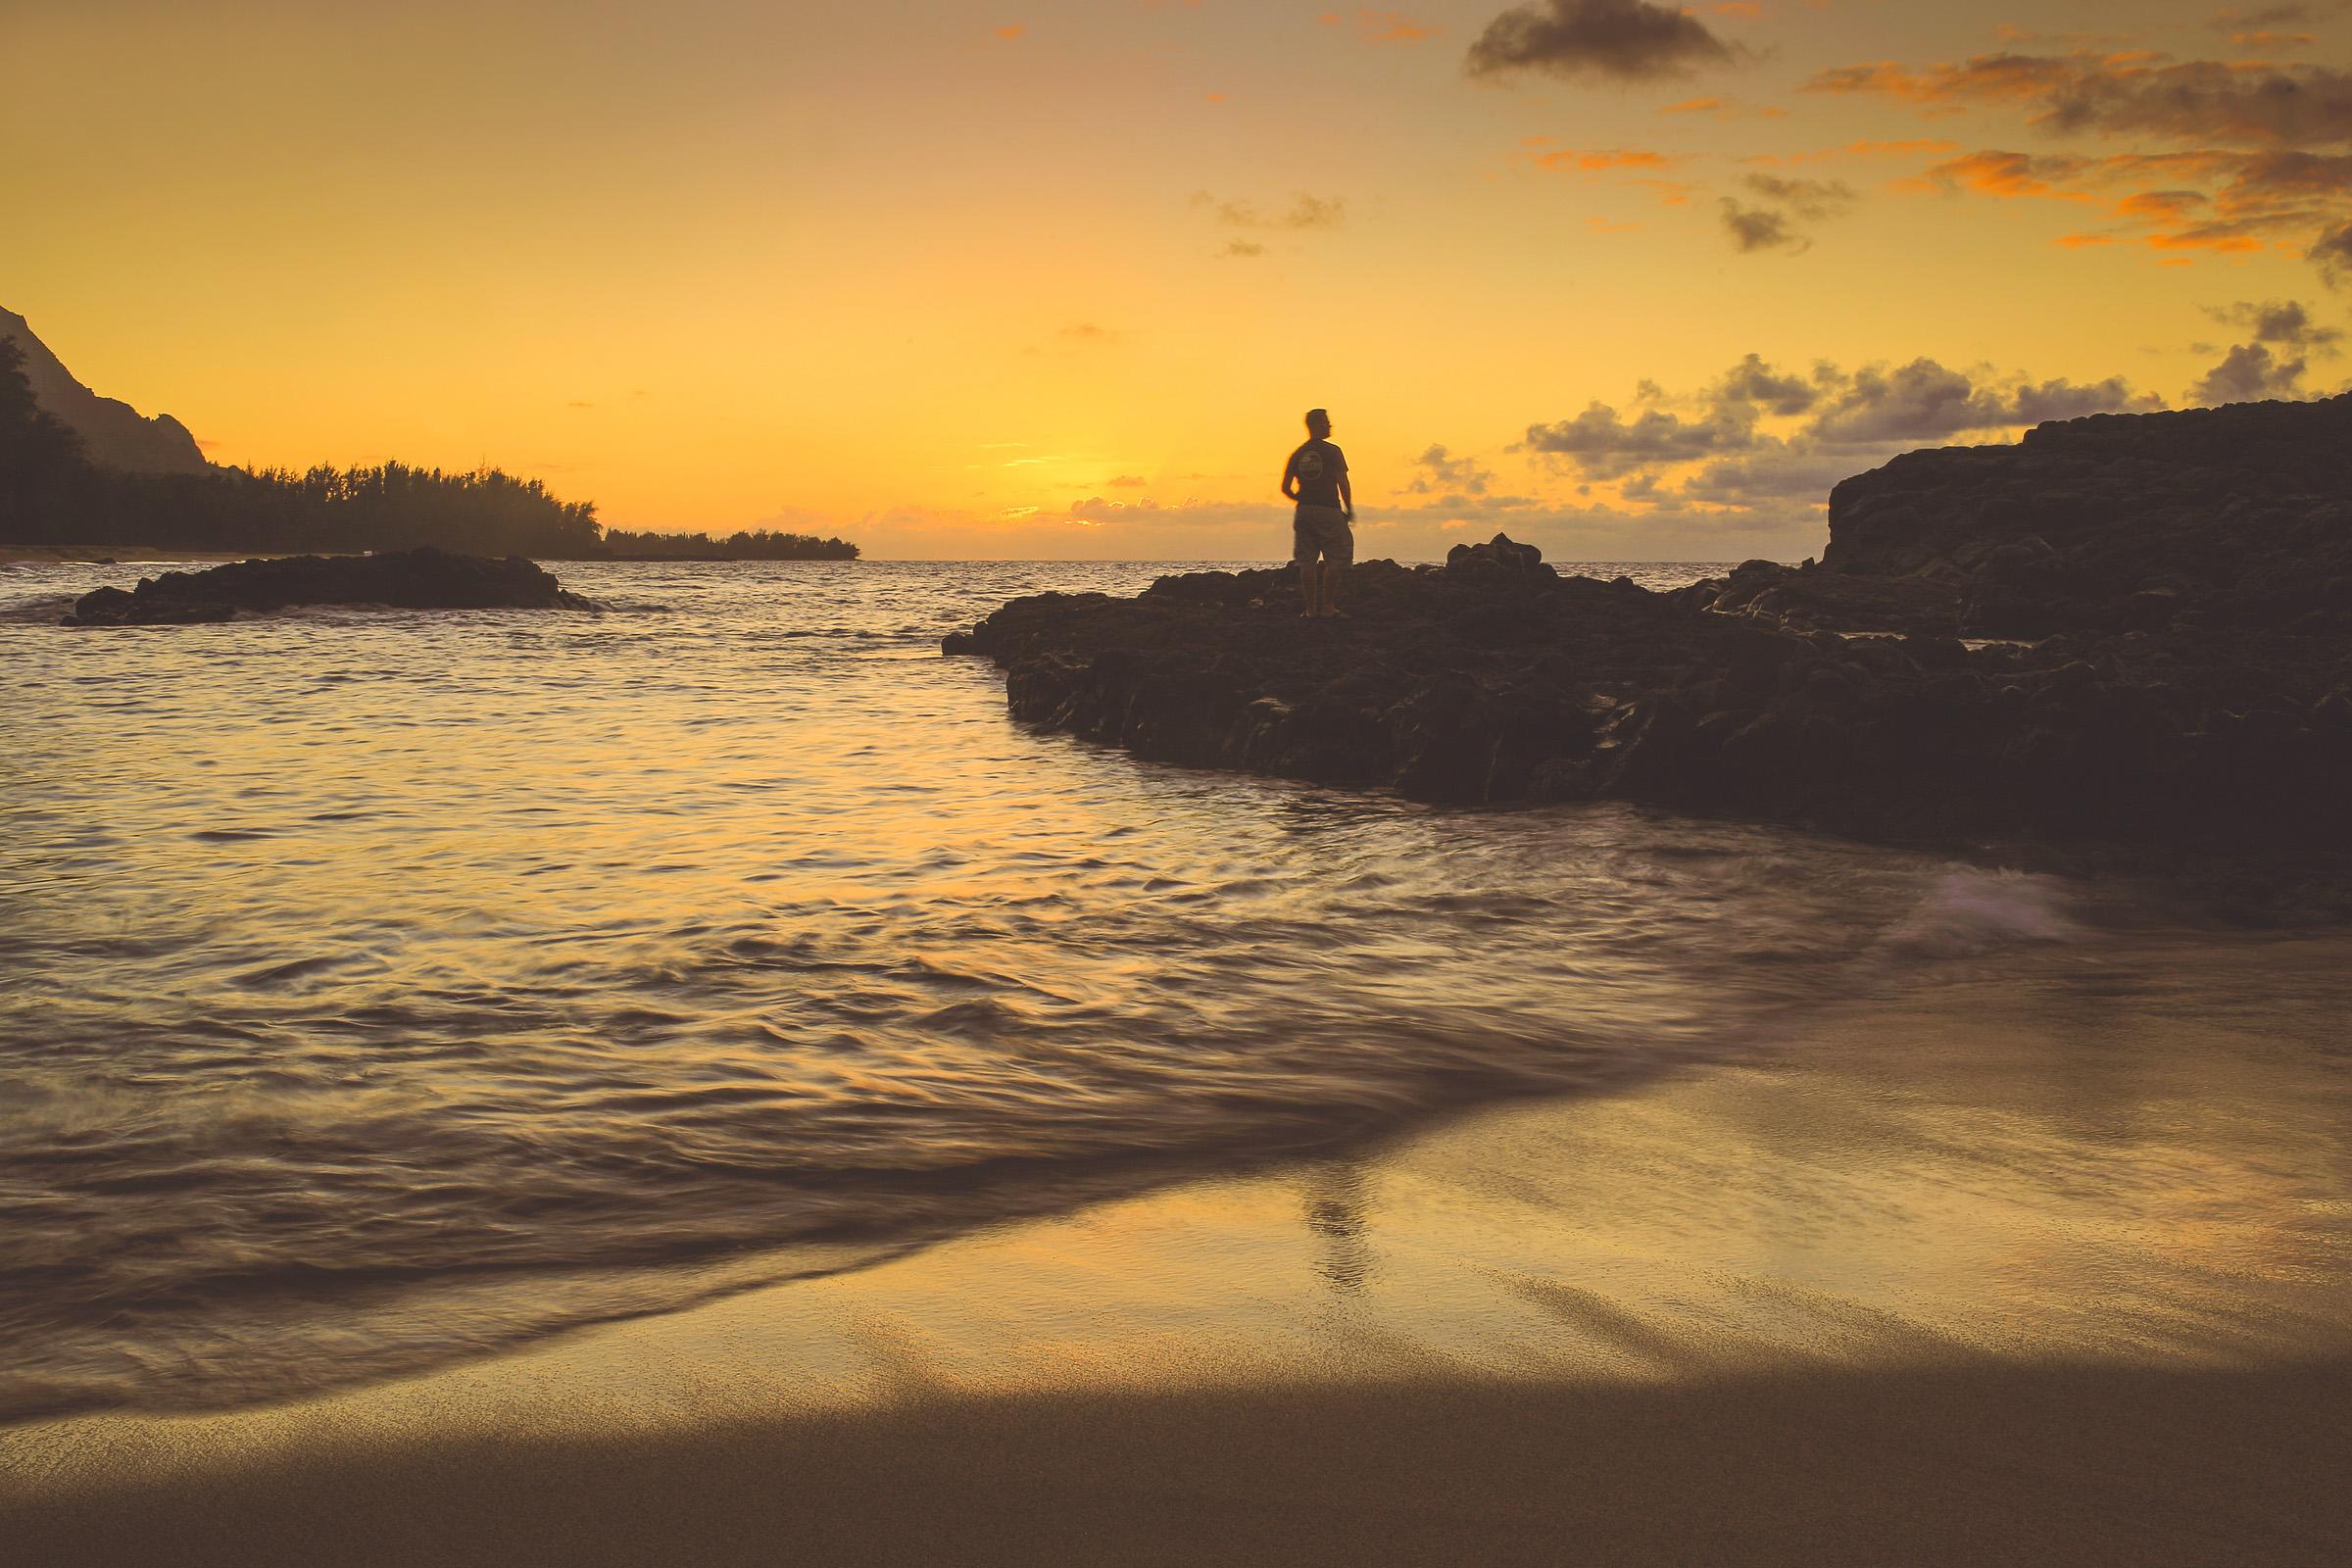 IMG_2942--KAUAI-HAWAII-JENNIFER-PICARD-PHOTOGRAPHY-SUNSET.jpg